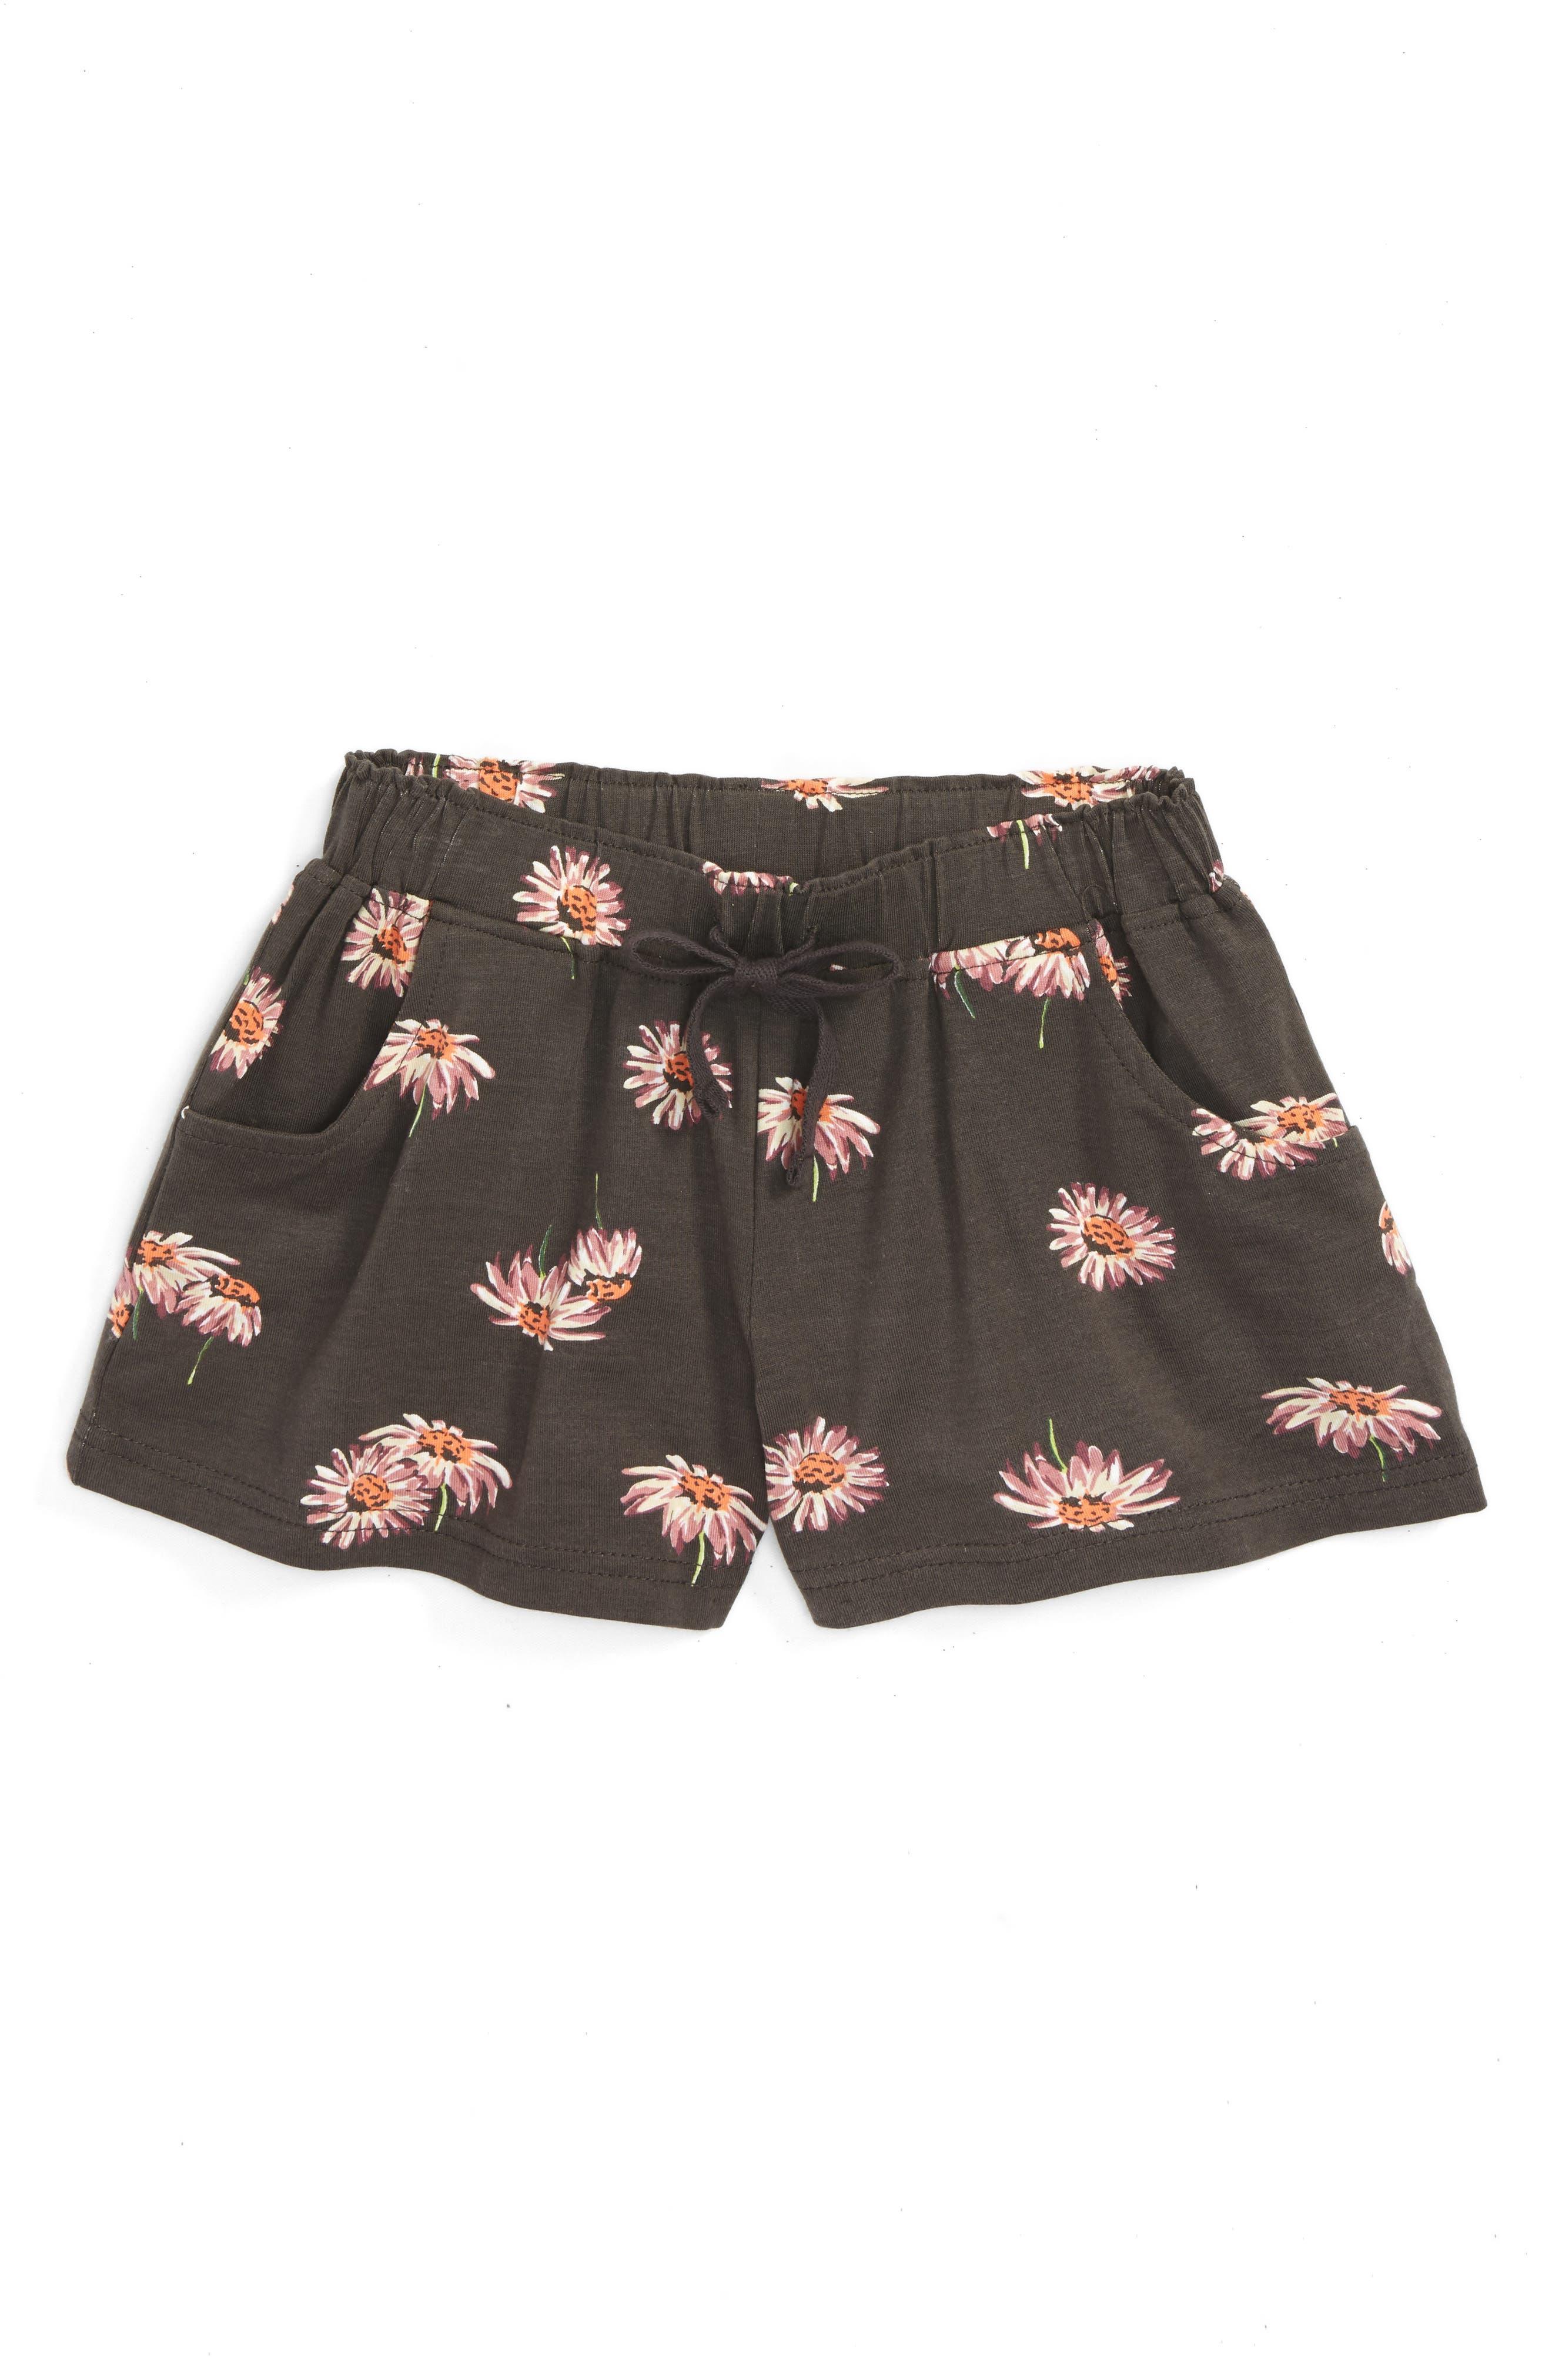 ONEILL Jayden Floral Shorts